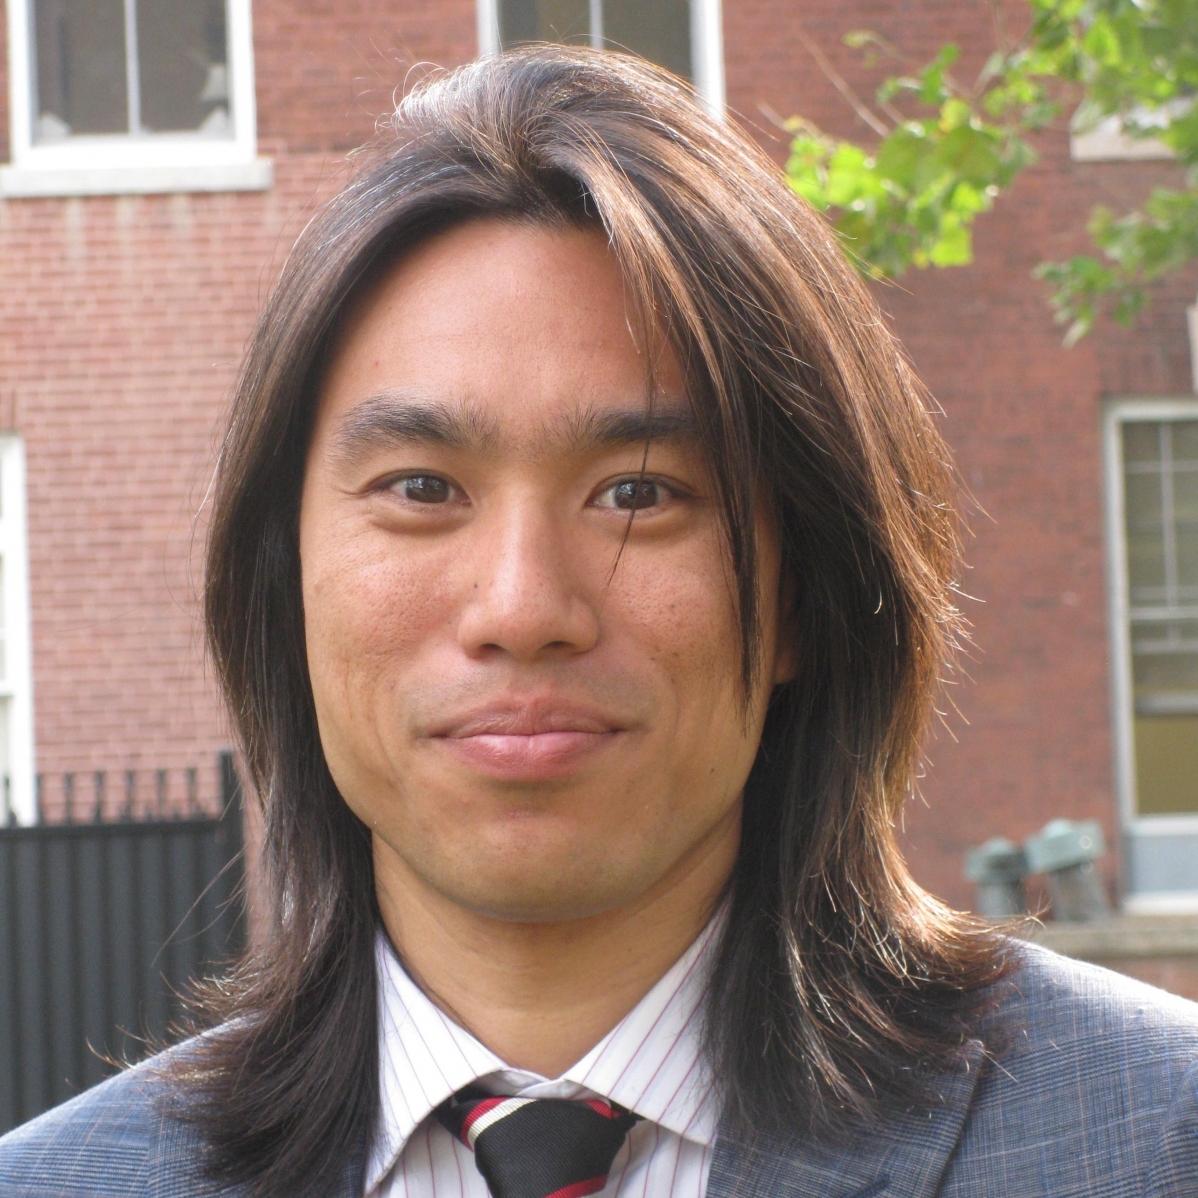 UMass Assistant Professor Nathan Chan